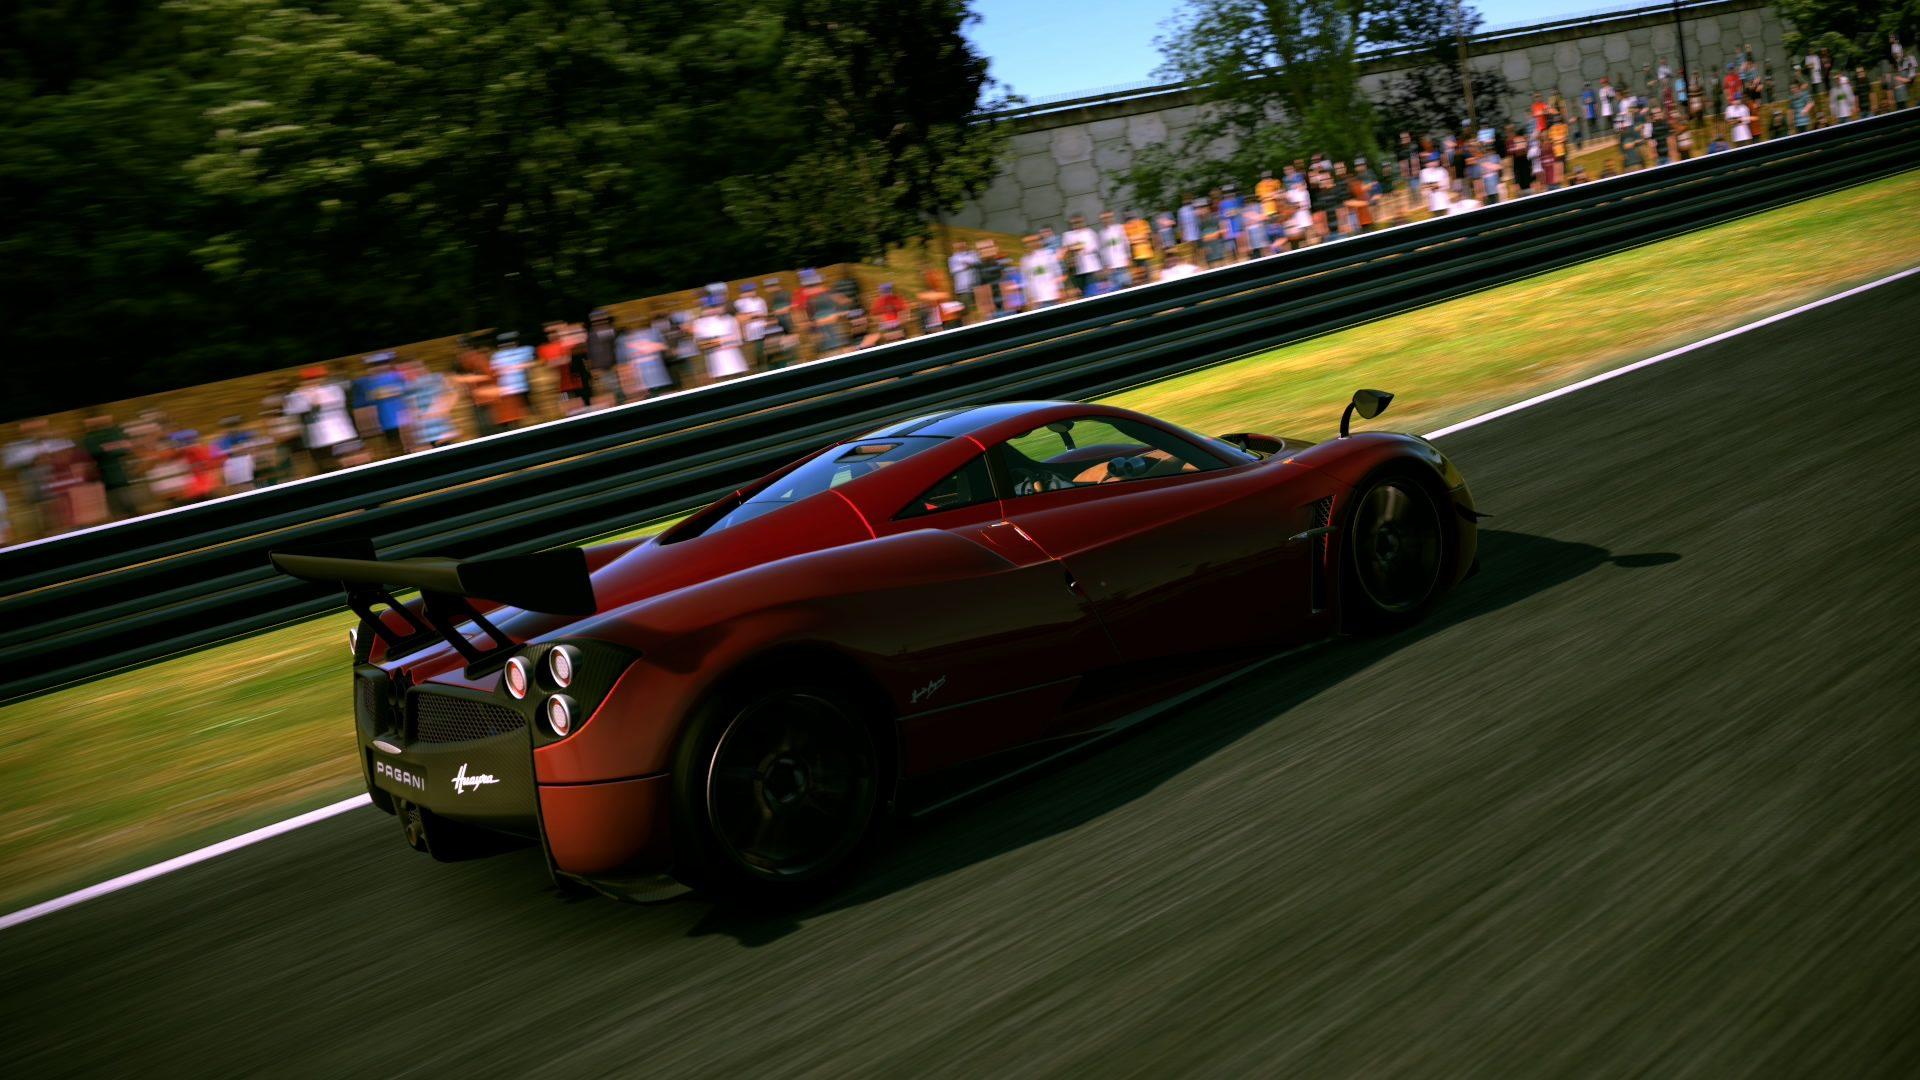 Circuit de la Sarthe 2013_114.jpg